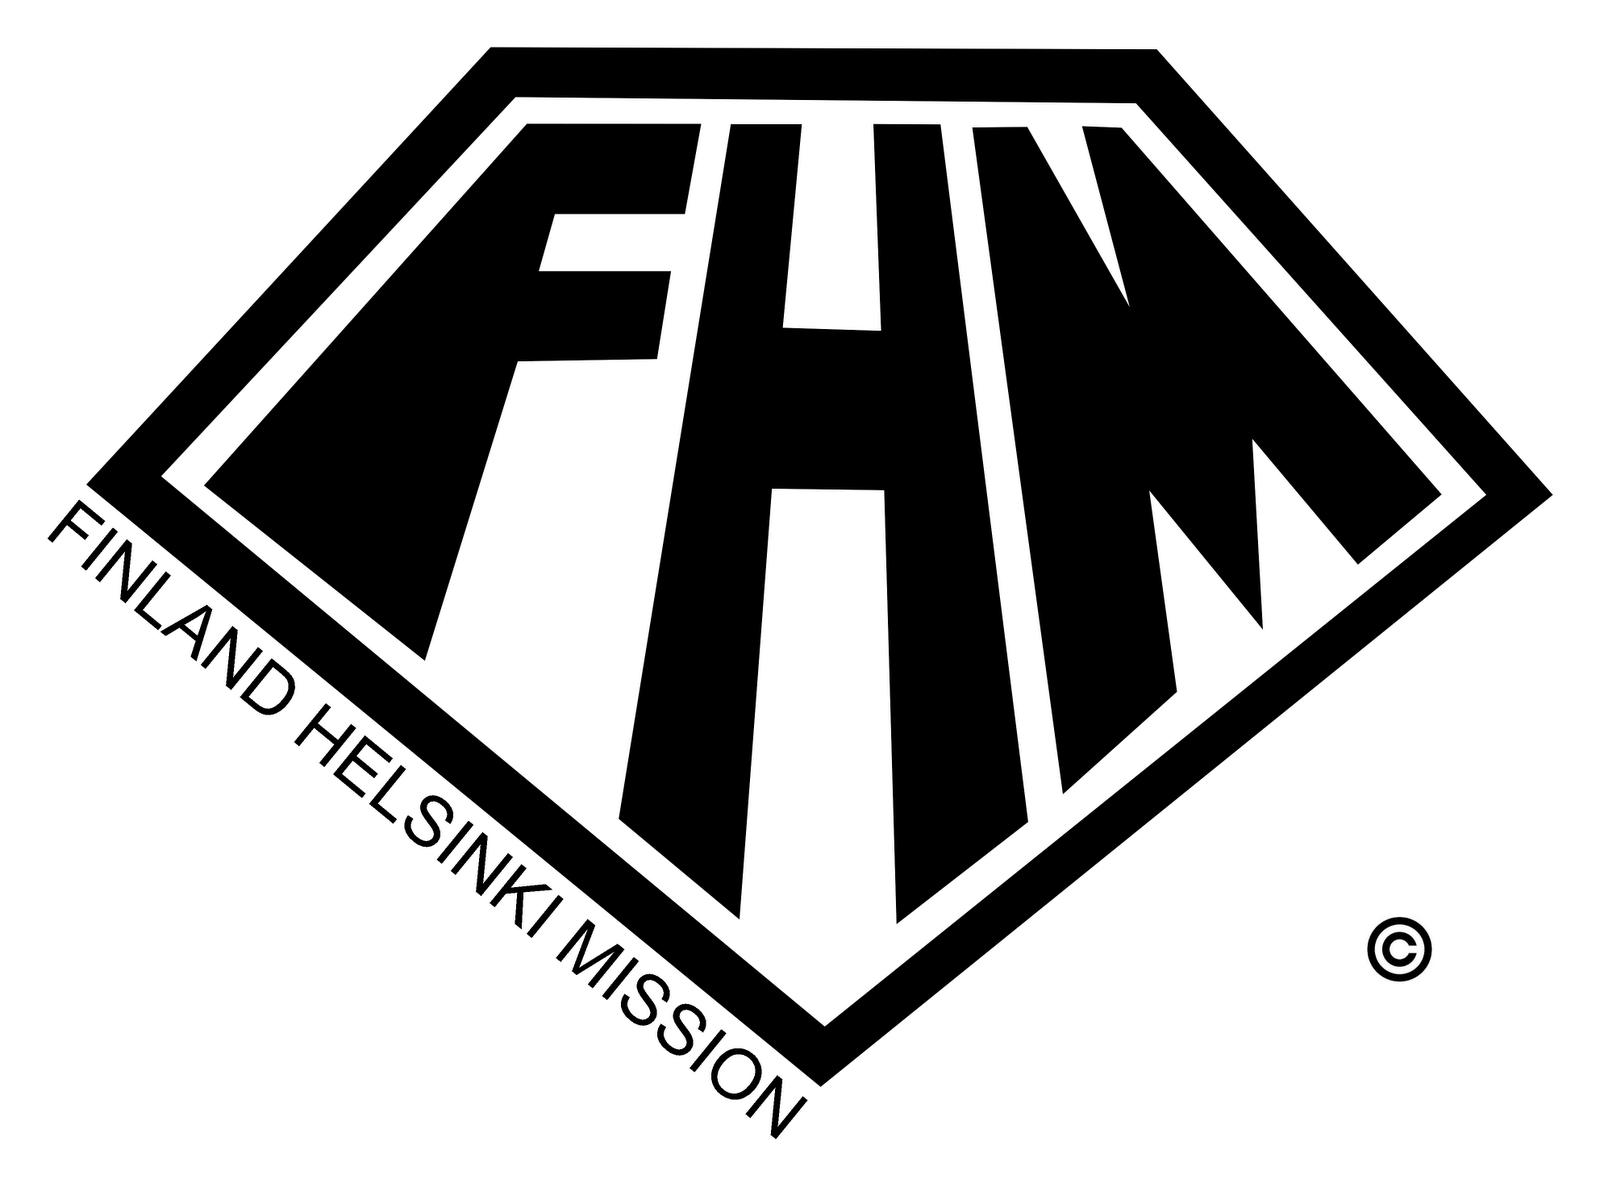 Helsinki Mission